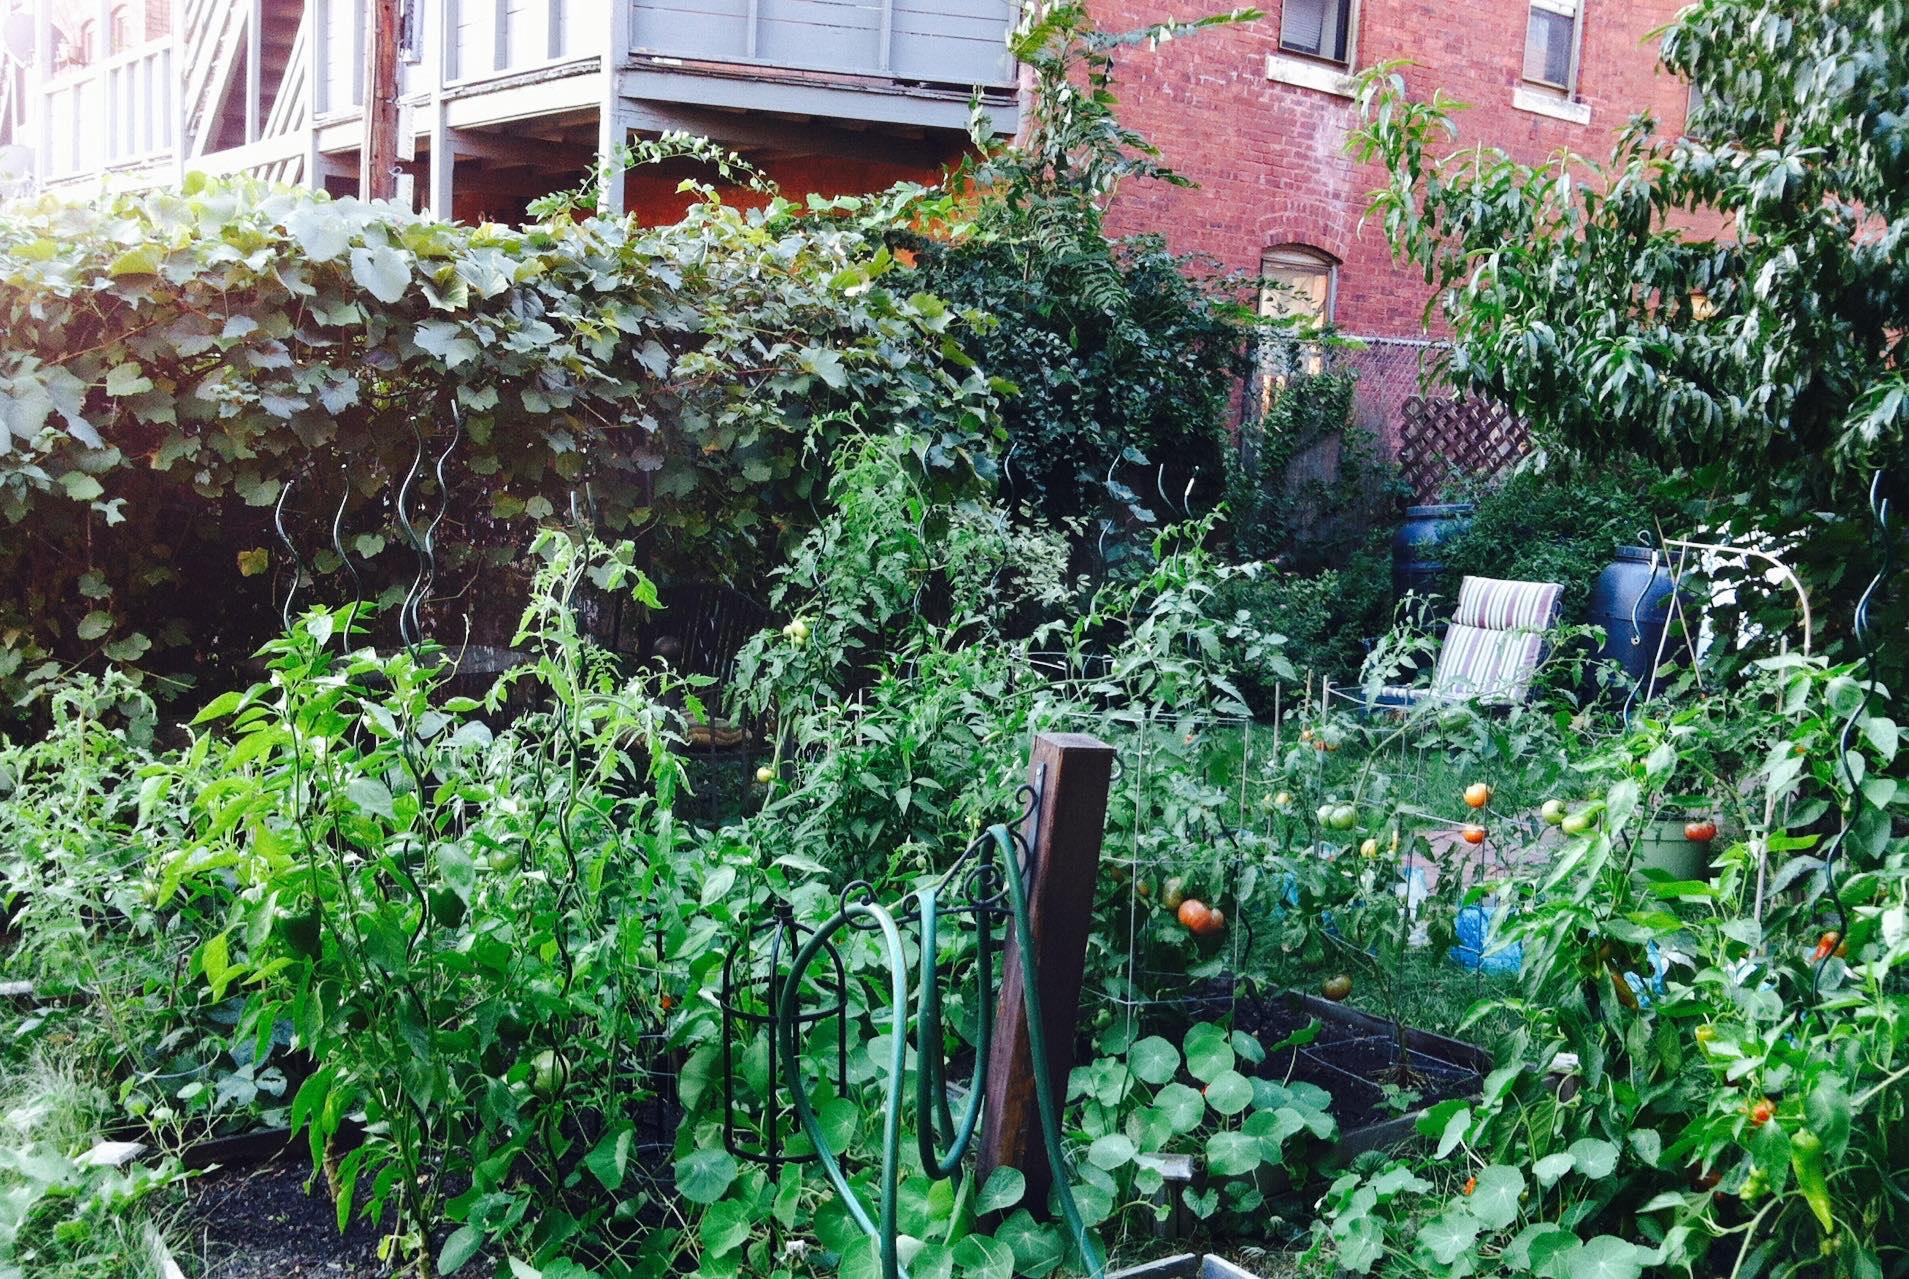 The backyard urban farm (Source: Steve Shultis)